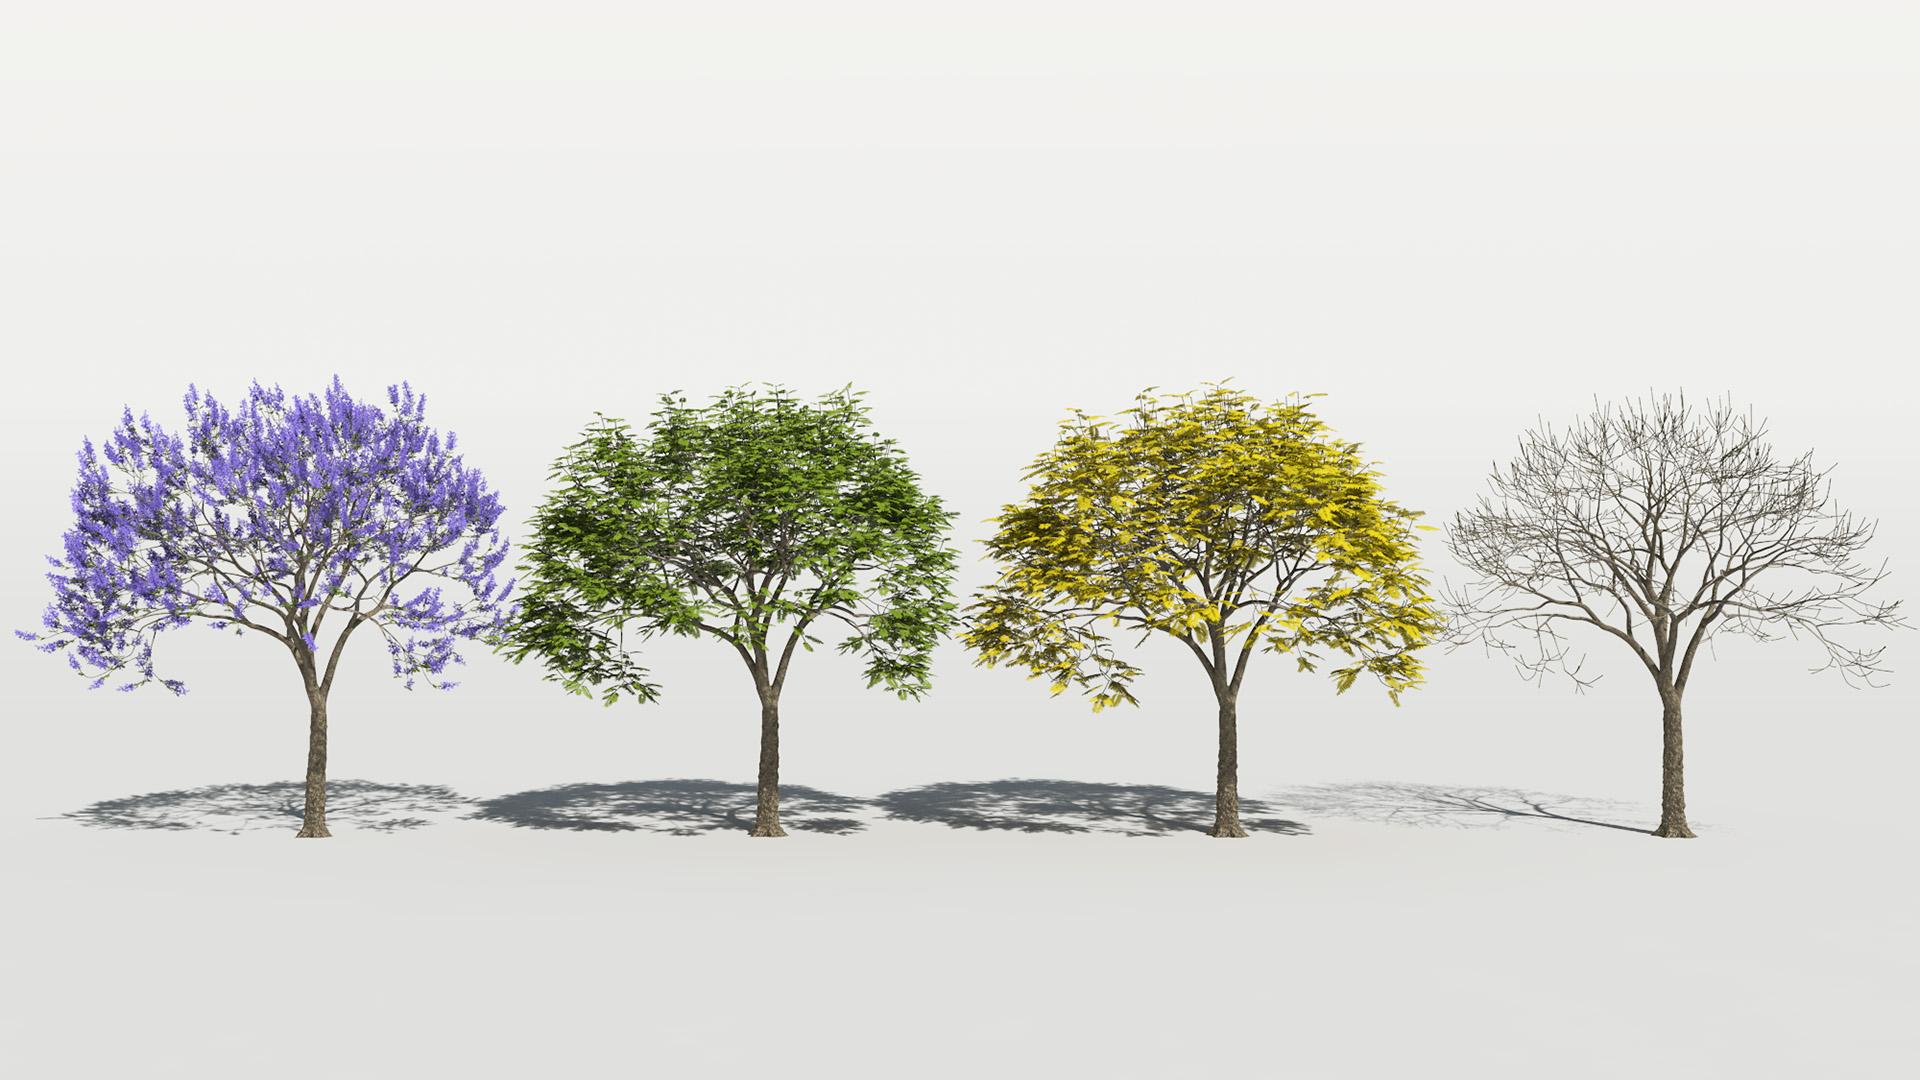 3D model of the Blue jacaranda Jacaranda mimosifolia season variations